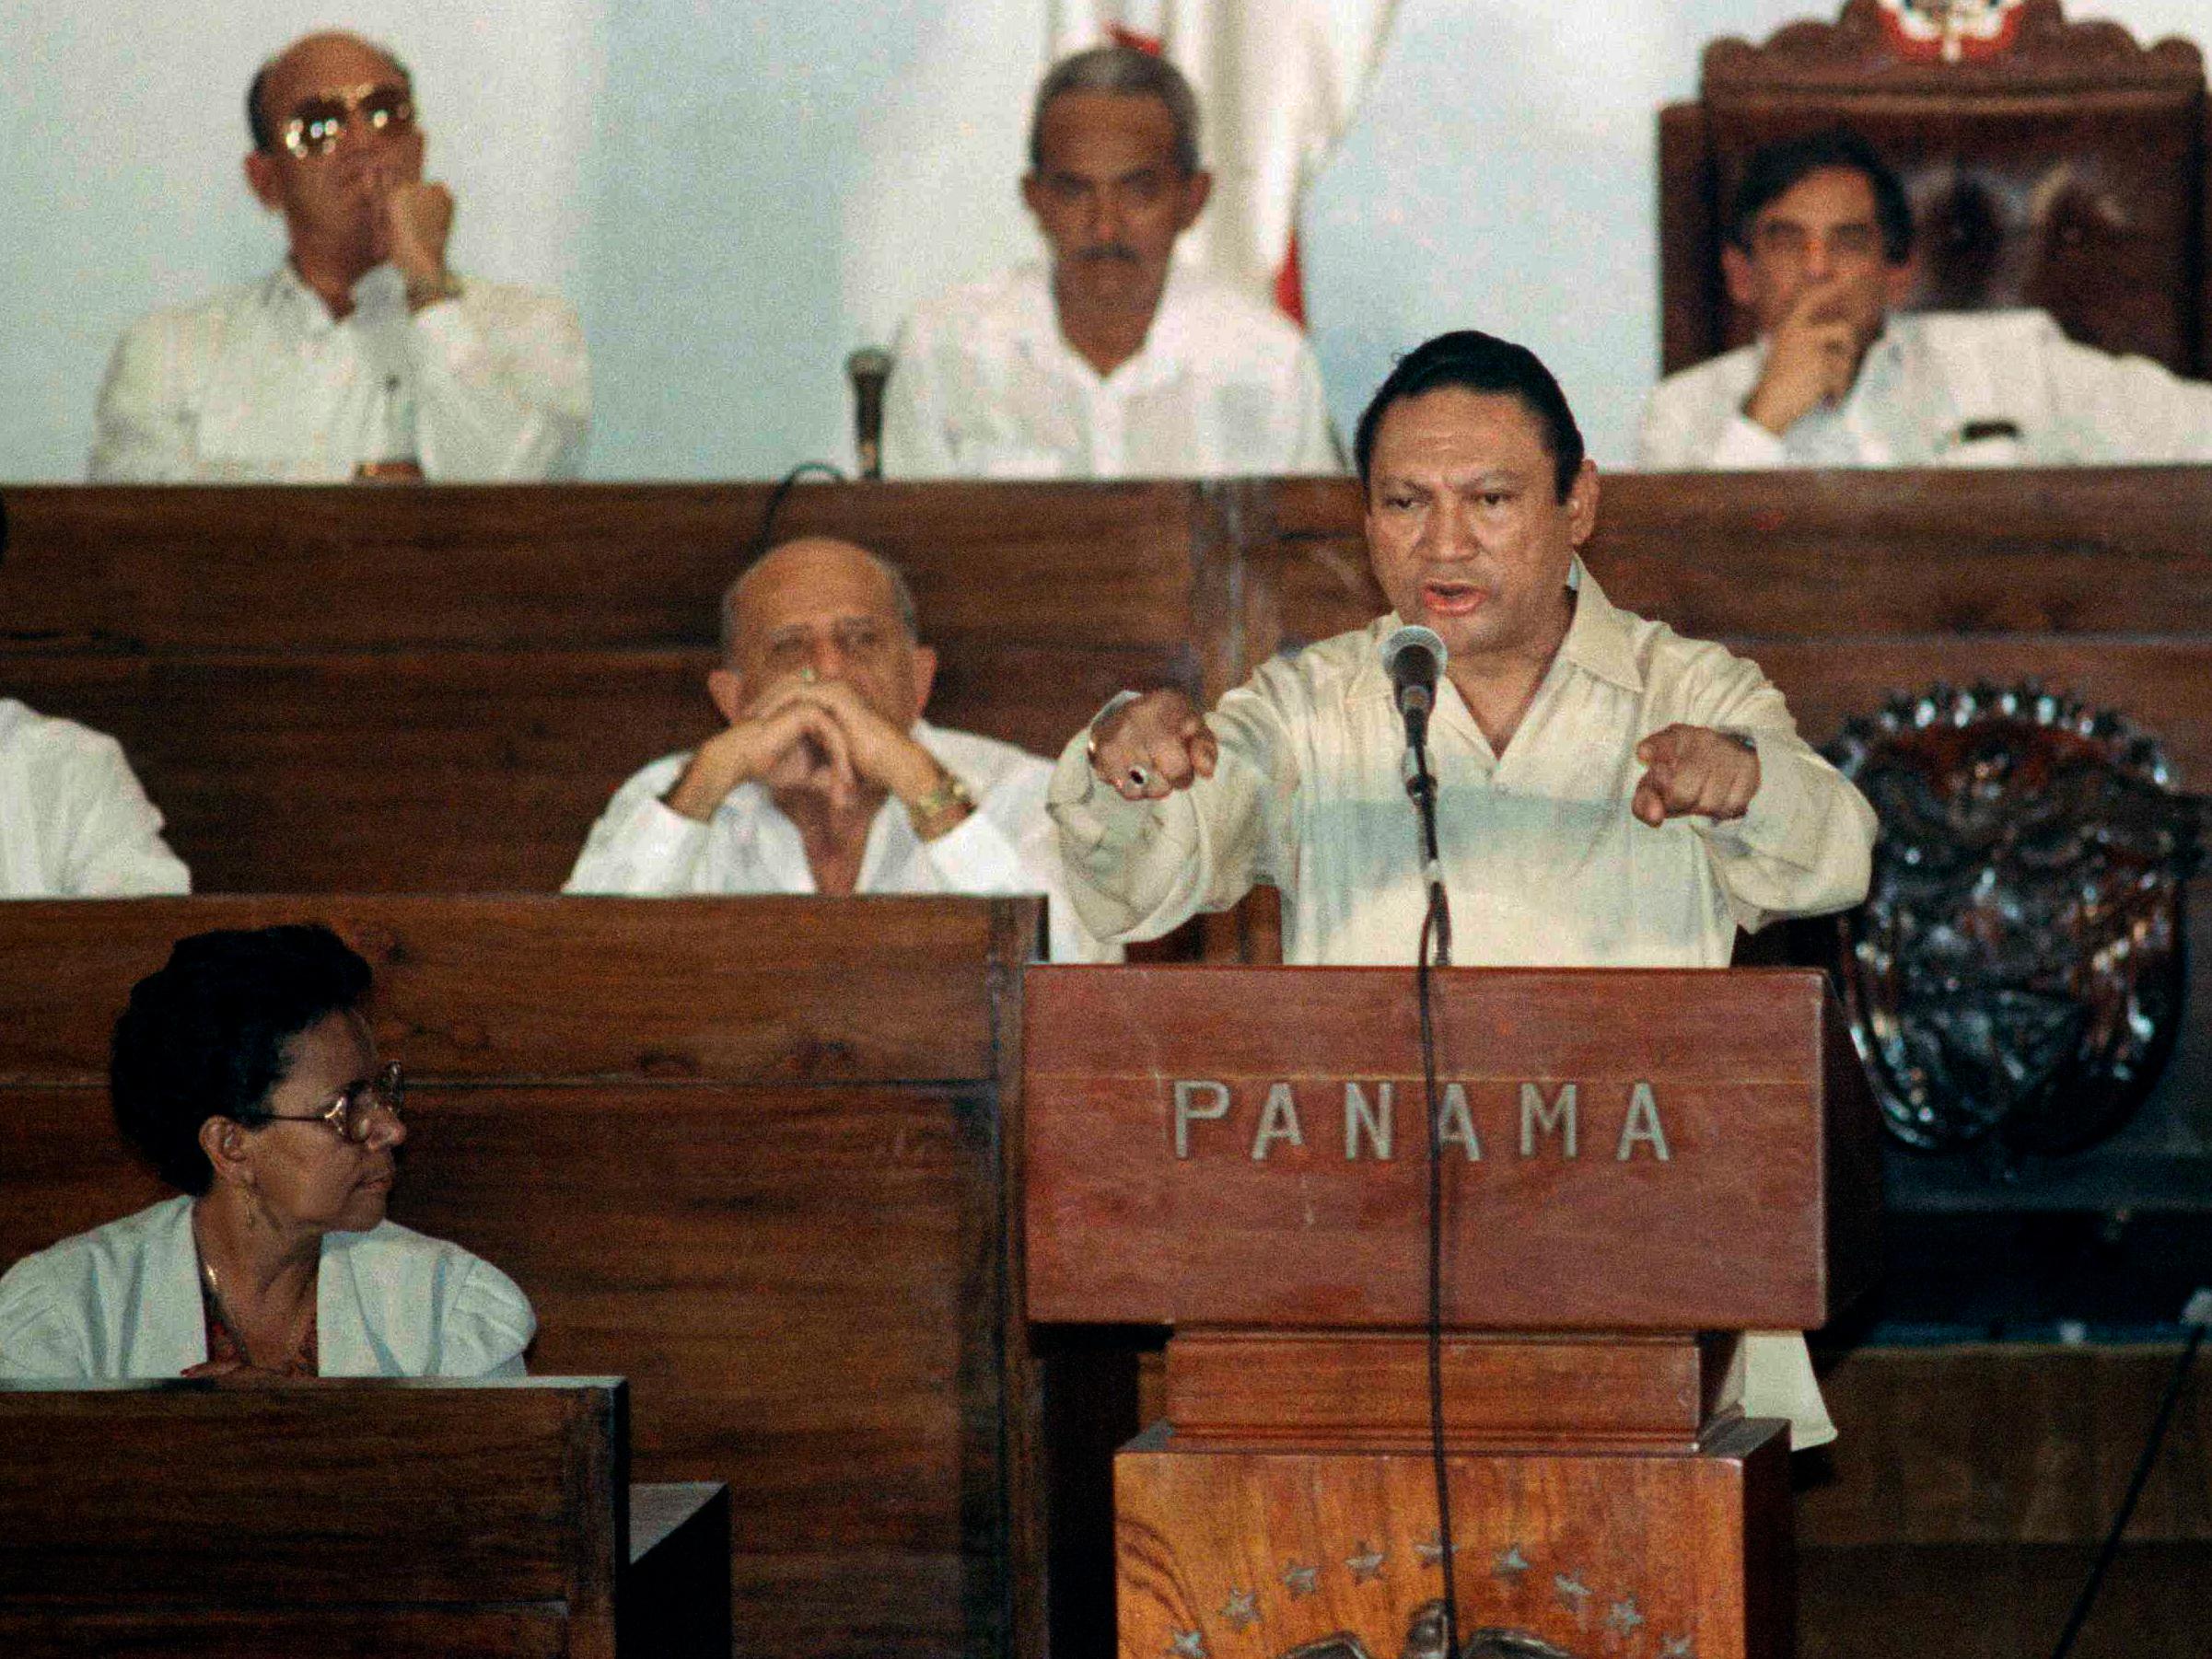 Former Panamanian leader Gen. Manuel Noriega delivers a speech in Panama City on Oct. 11, 1989. (Matias Recart/AP)